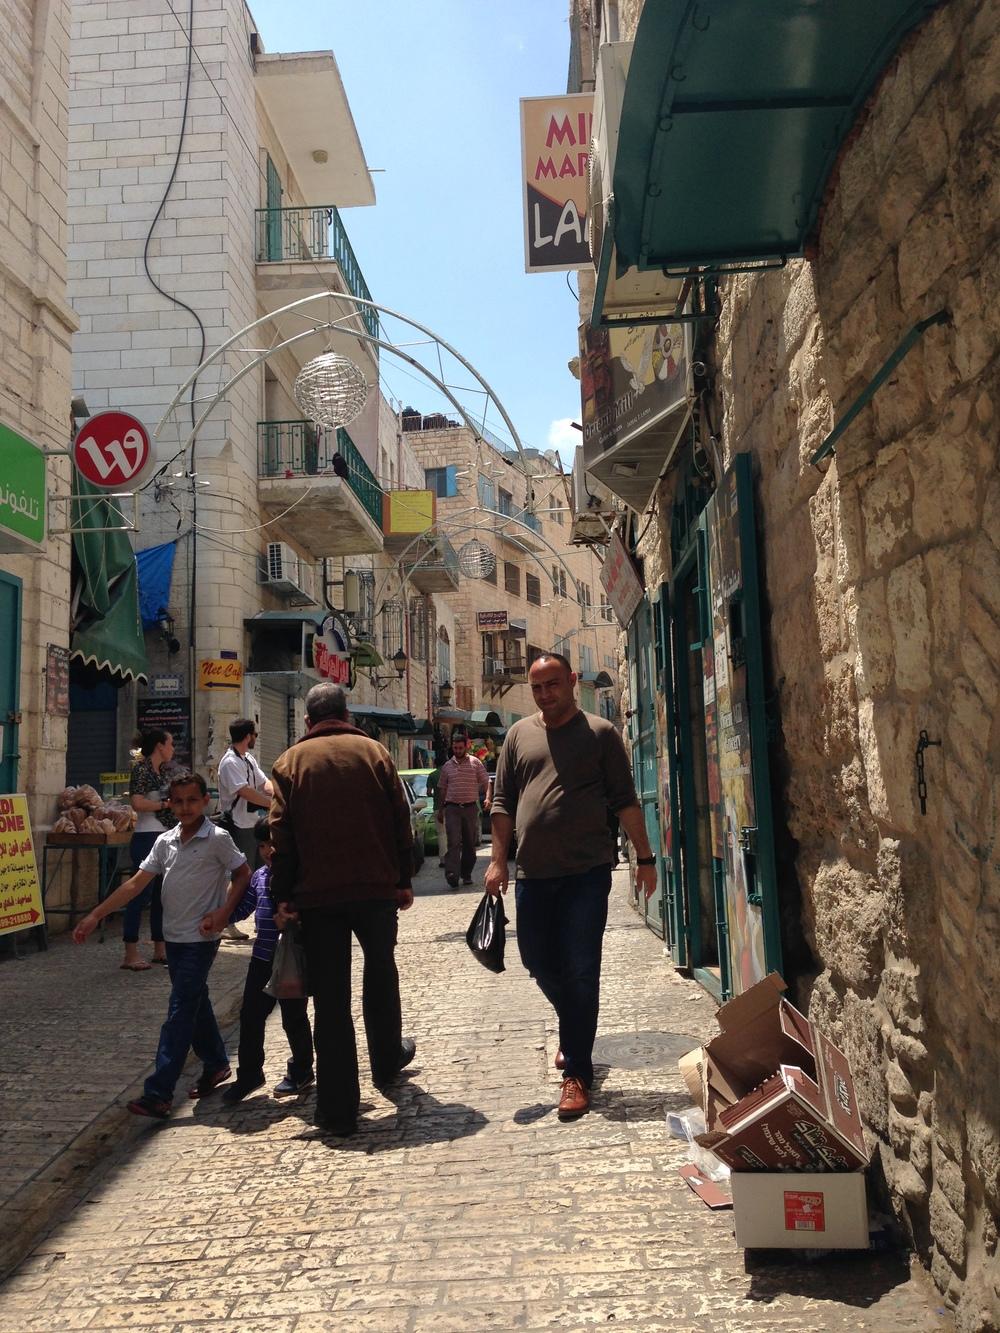 Bethlehem, Israel (the West Bank)